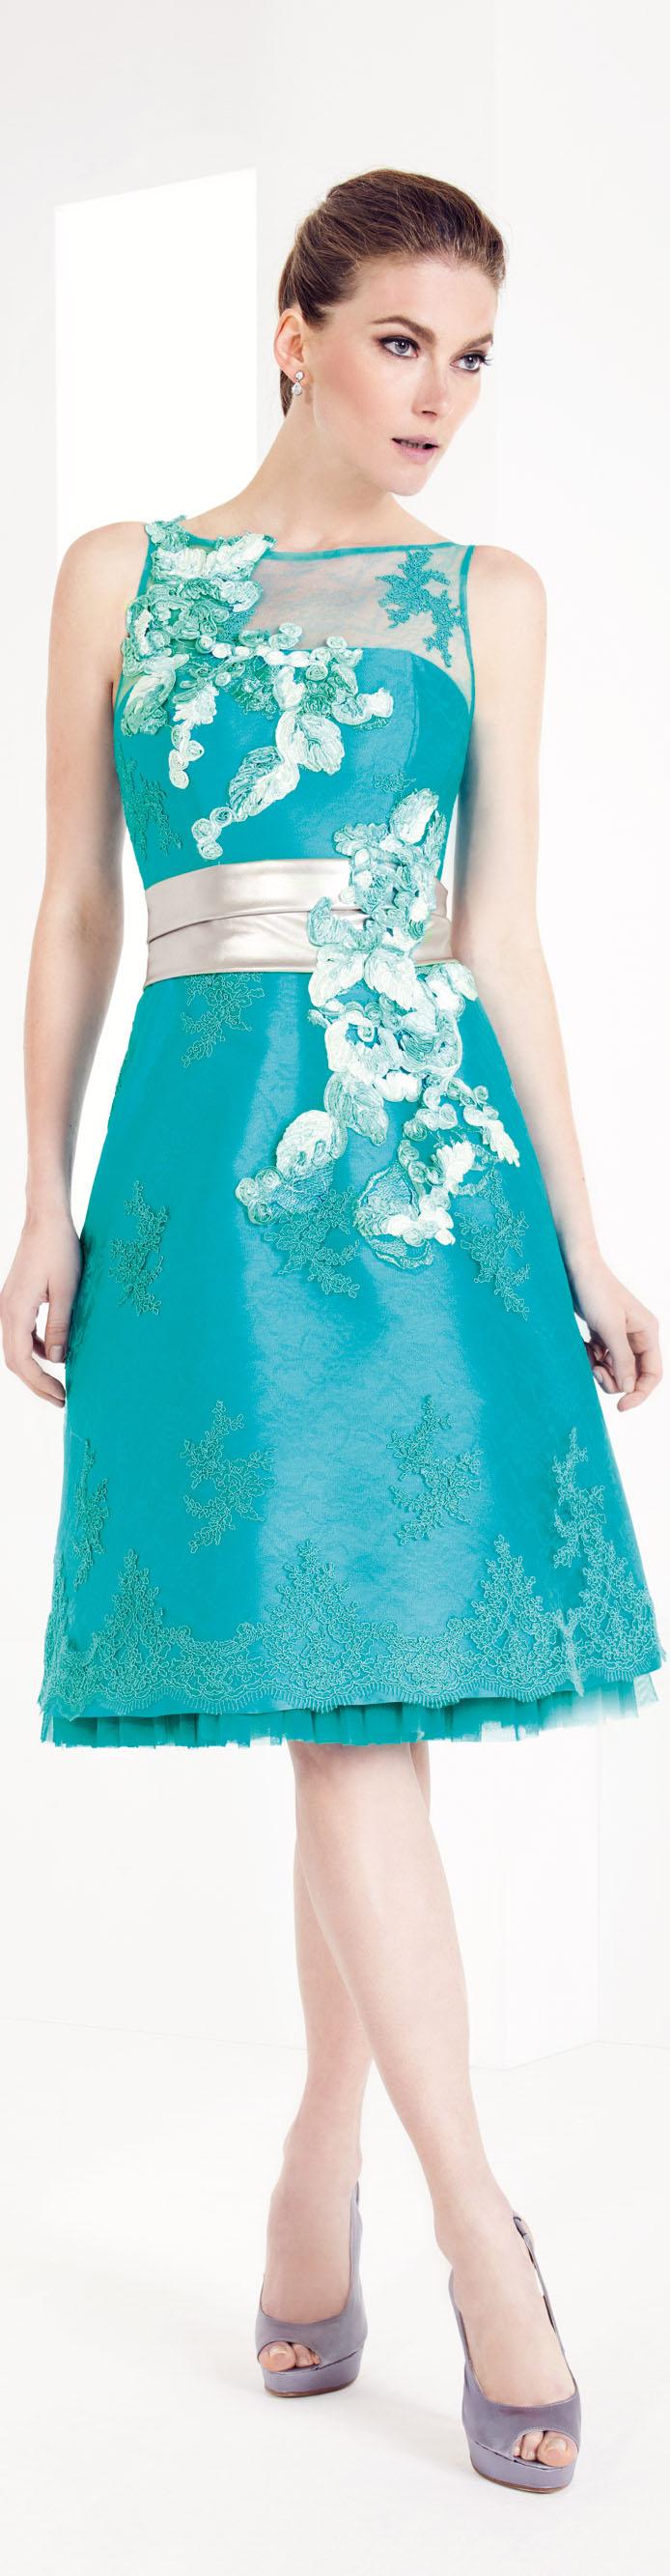 The Patricia Avendano Party Dresses 2015 Collection   ❤ Fashion ...